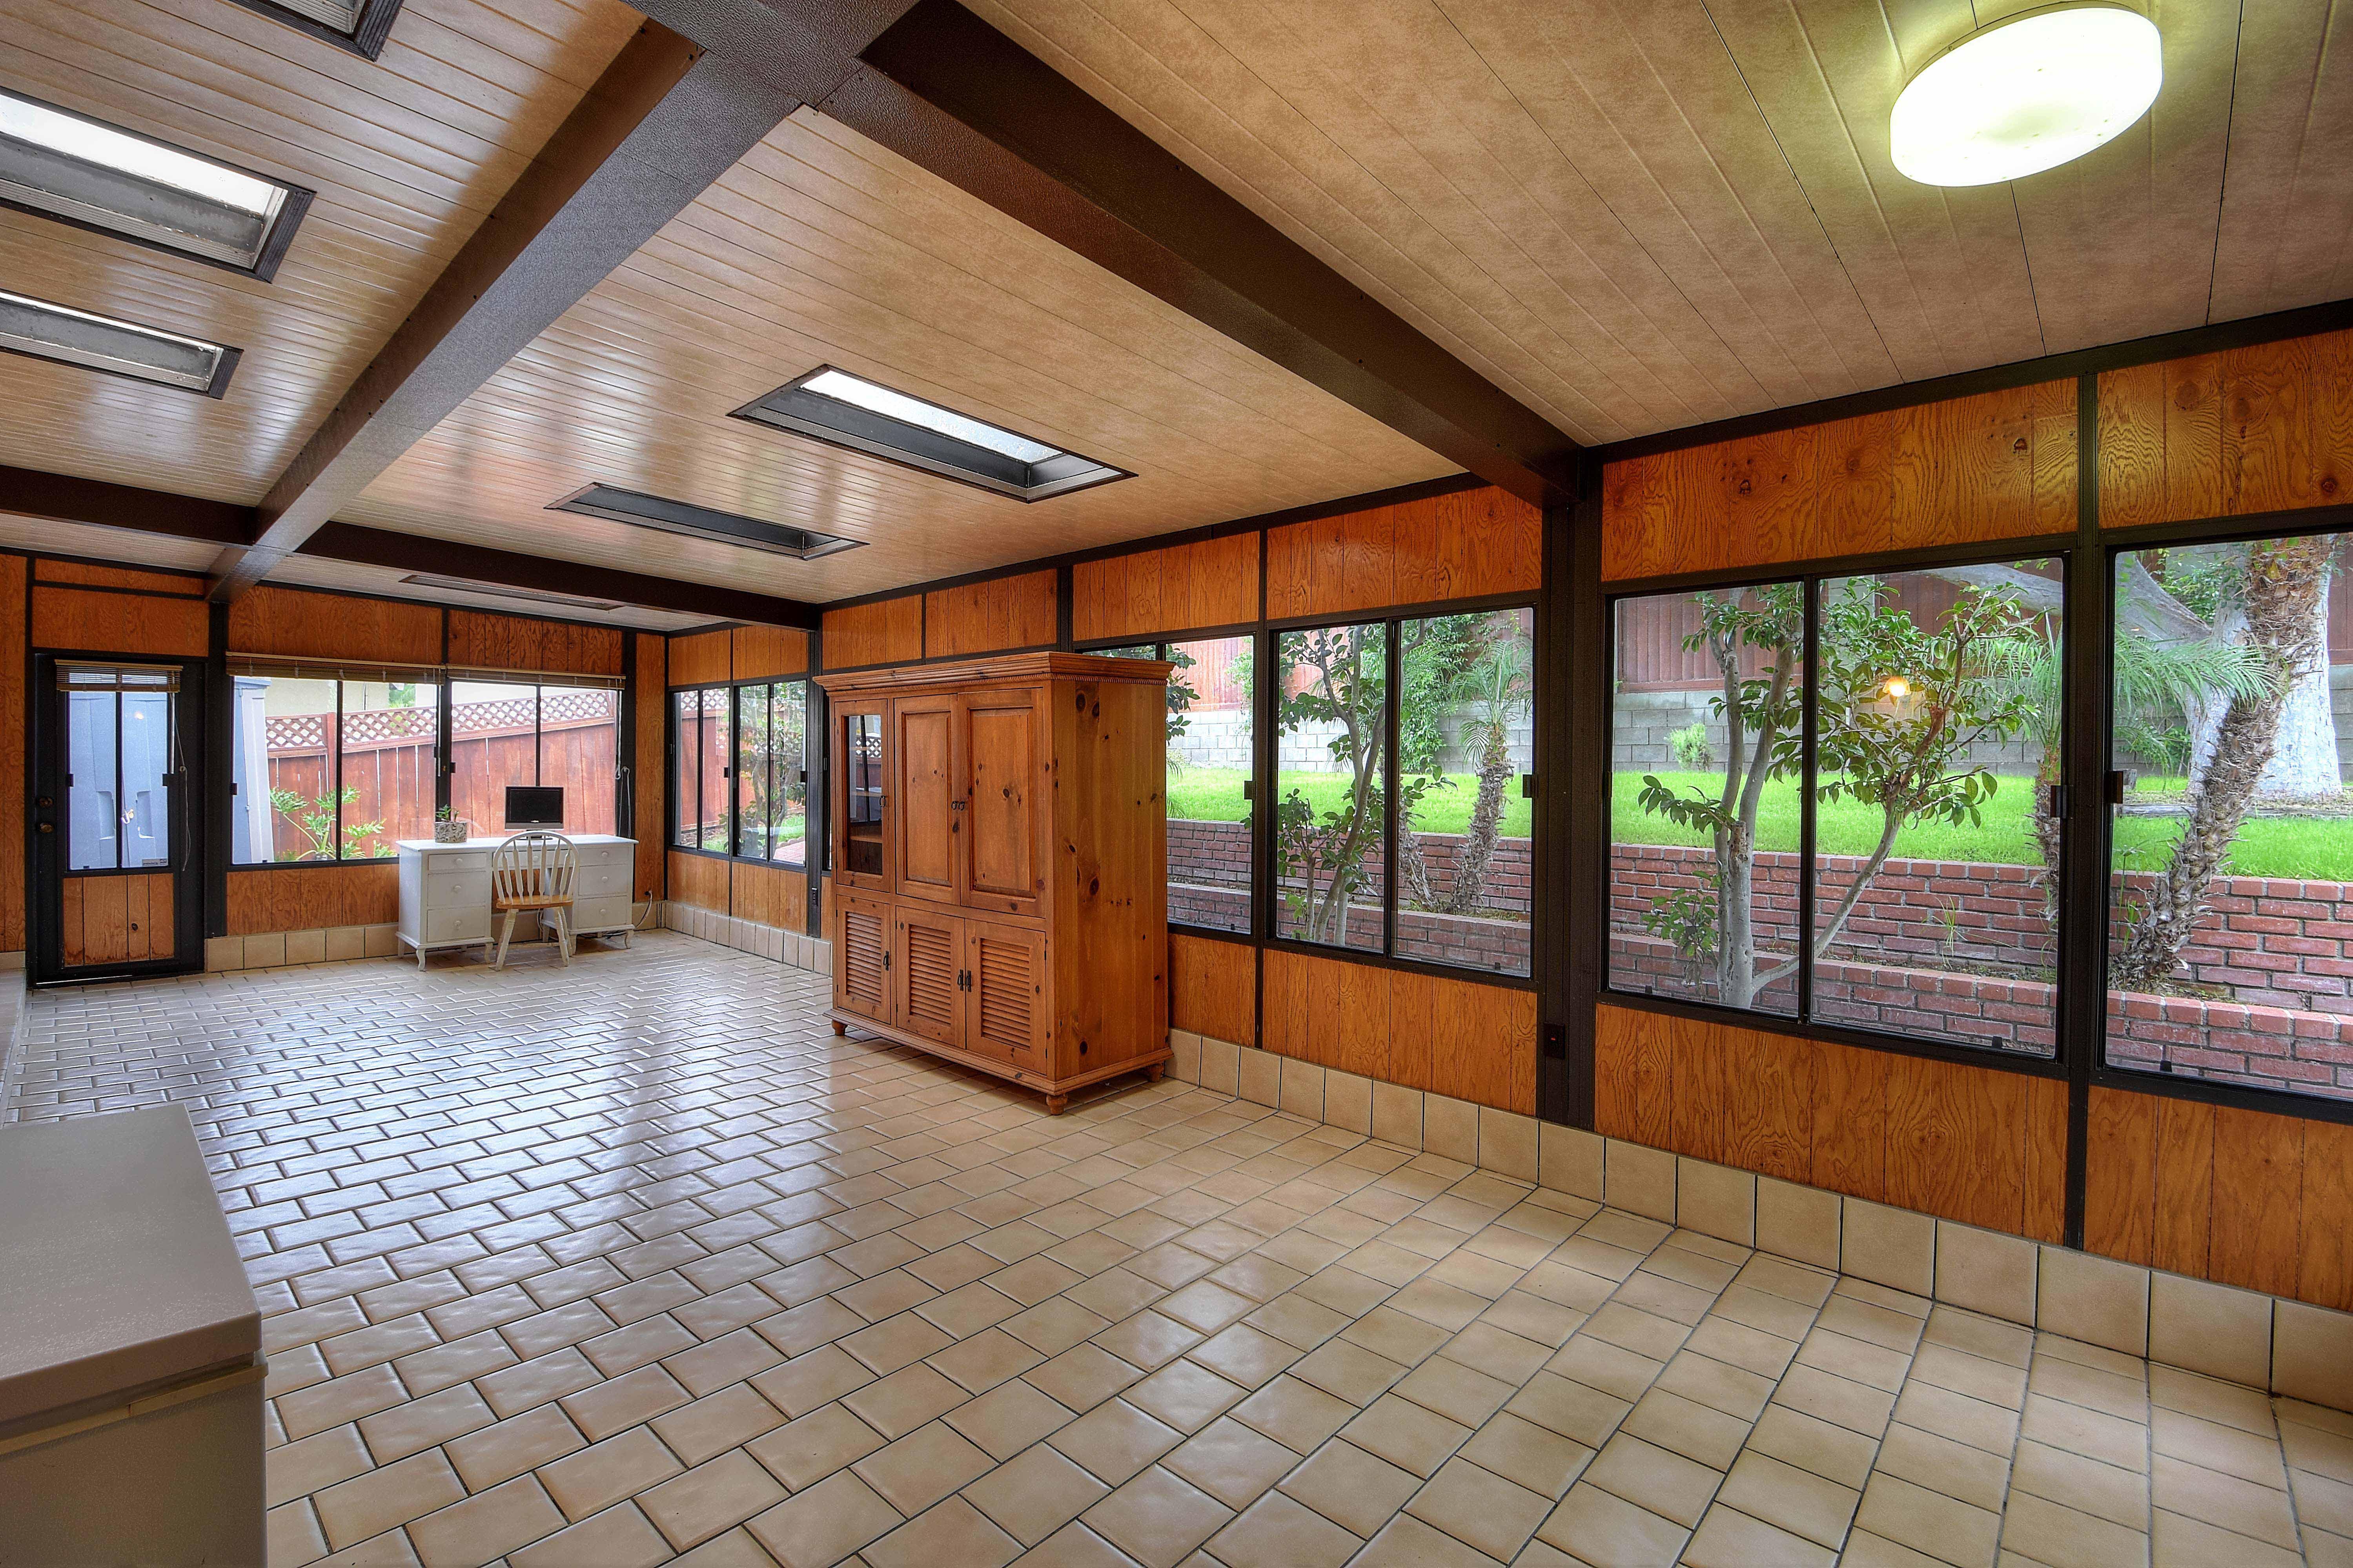 417-Via-Pasqula-enclosed-porch1